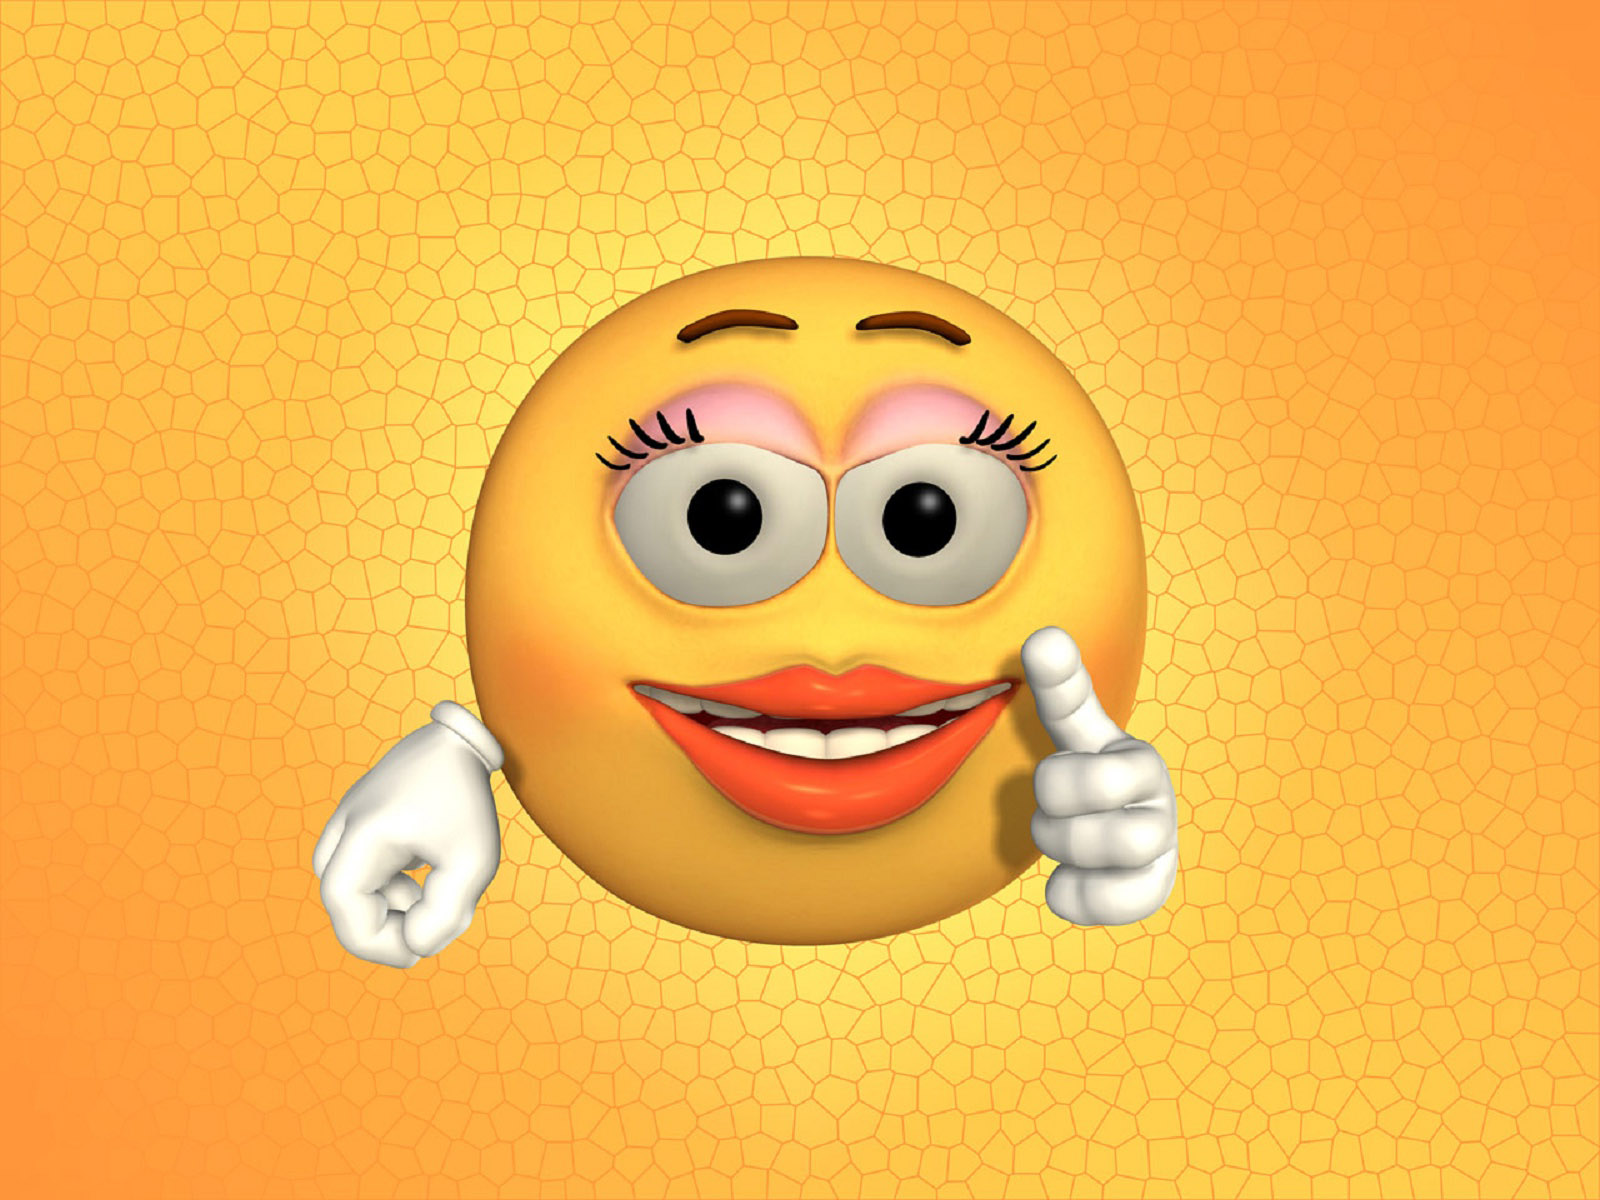 Wallpaper Cute Emojis Bonewallpaper Best Desktop Hd Wallpapers Funny Desktop